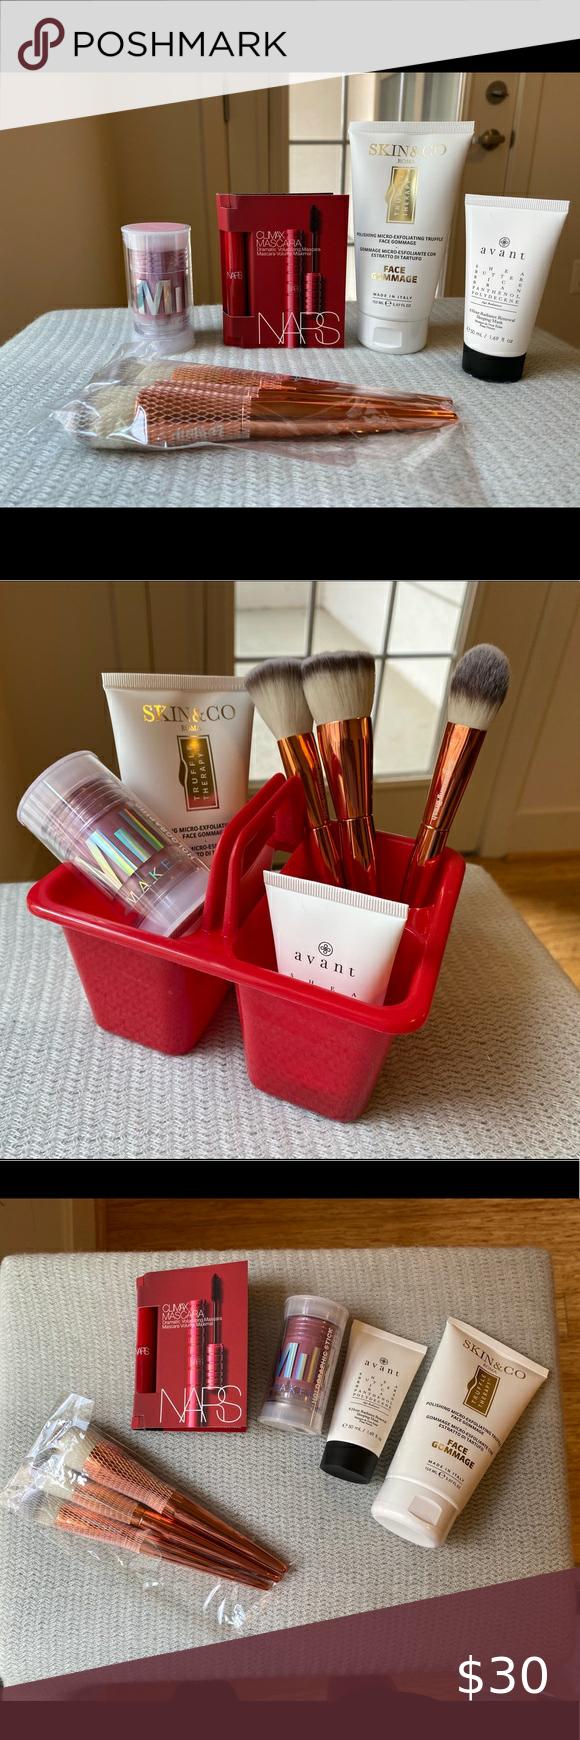 Makeup and Skin Care Bundle lipstick 💄 in 2020 Milk